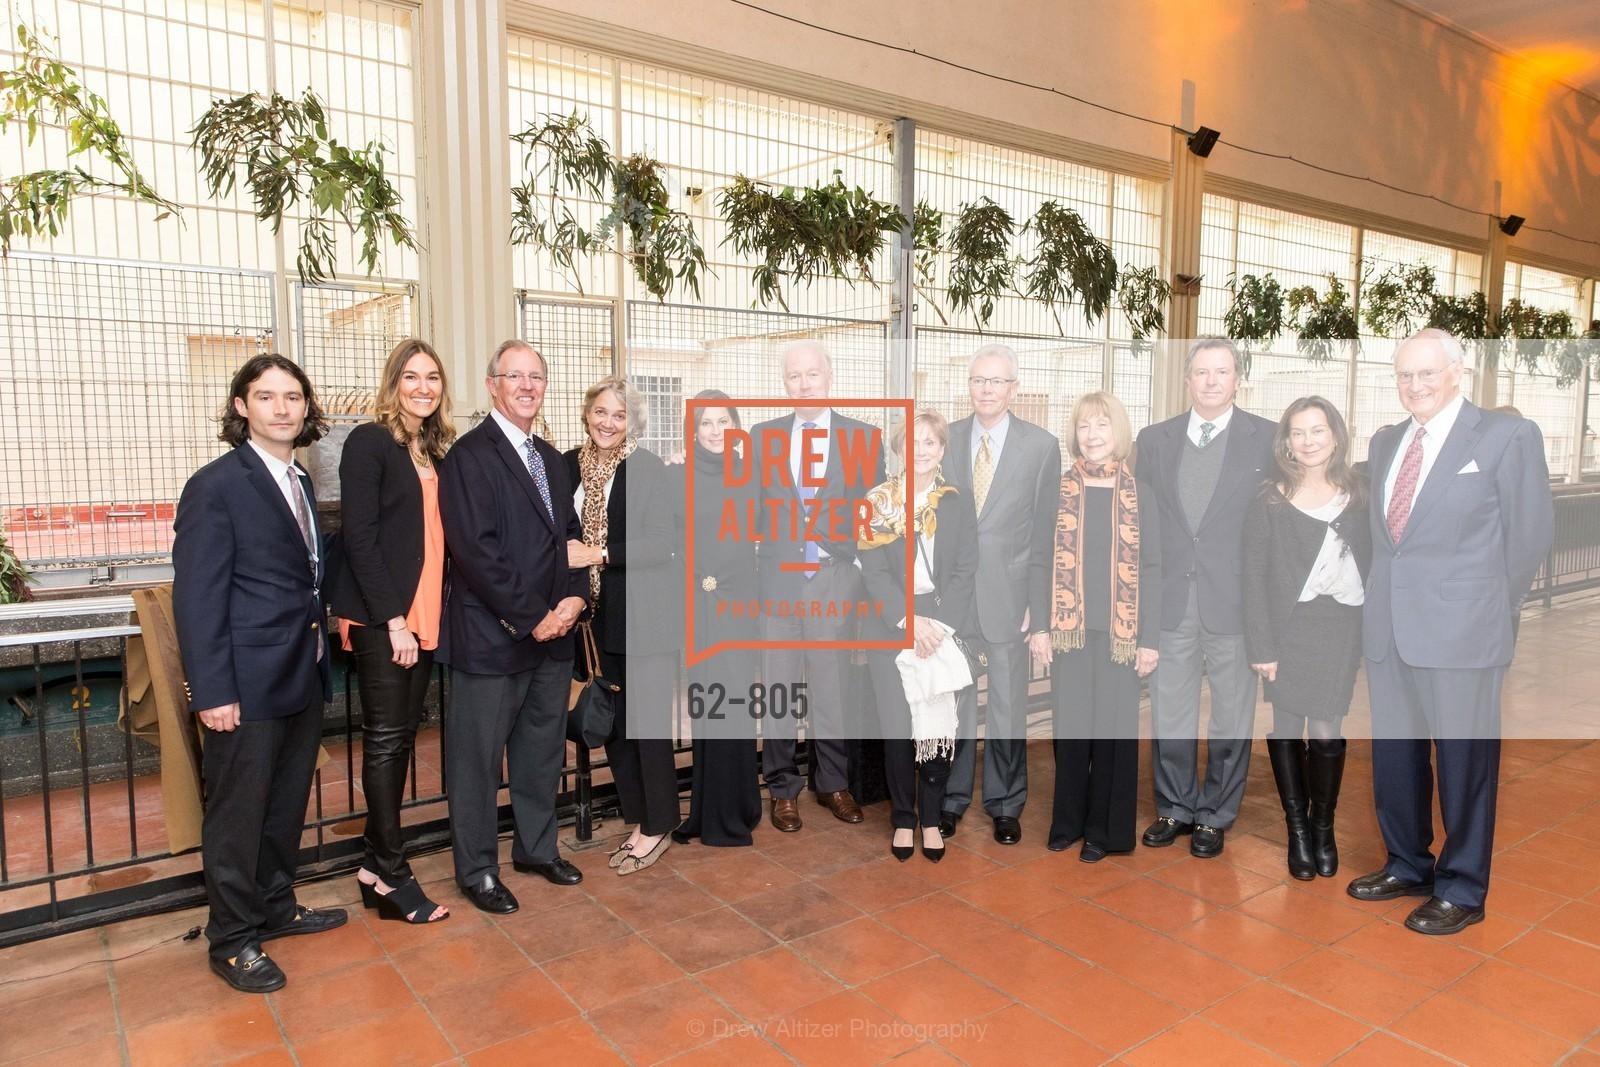 Tad Moore, Katharine Morris, Jamie Greene, Marritje Greene, Isabel Moore, Stephanie Keeney, Bob Keeney, Sandra Morris, John Stewart, Sue Stewart, George Morris, Photo #62-805